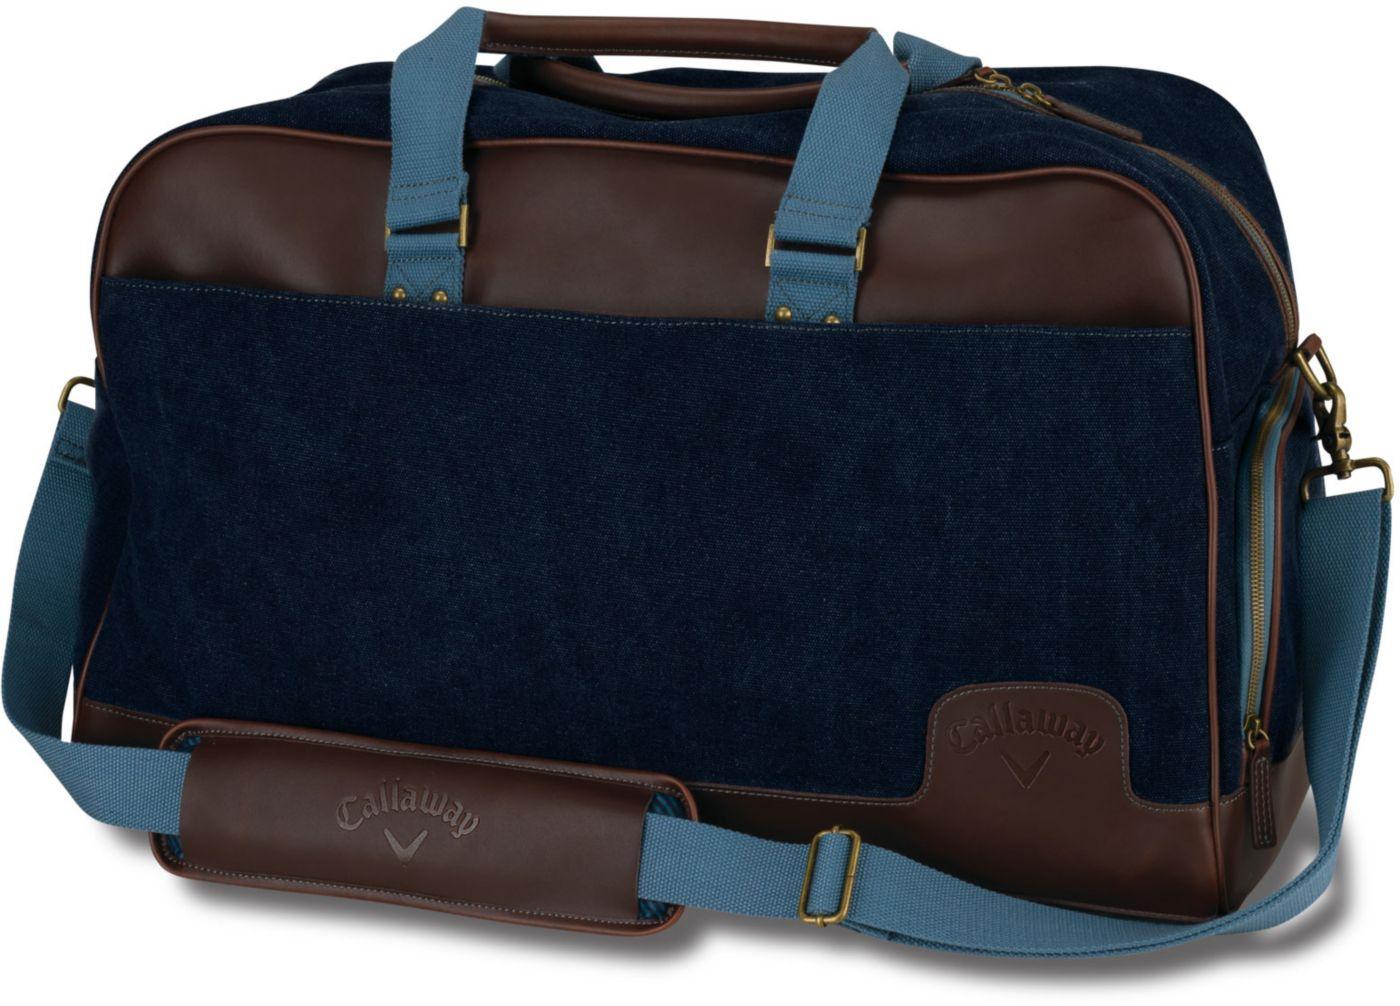 Callaway Tour Authentic Large Duffle Bag